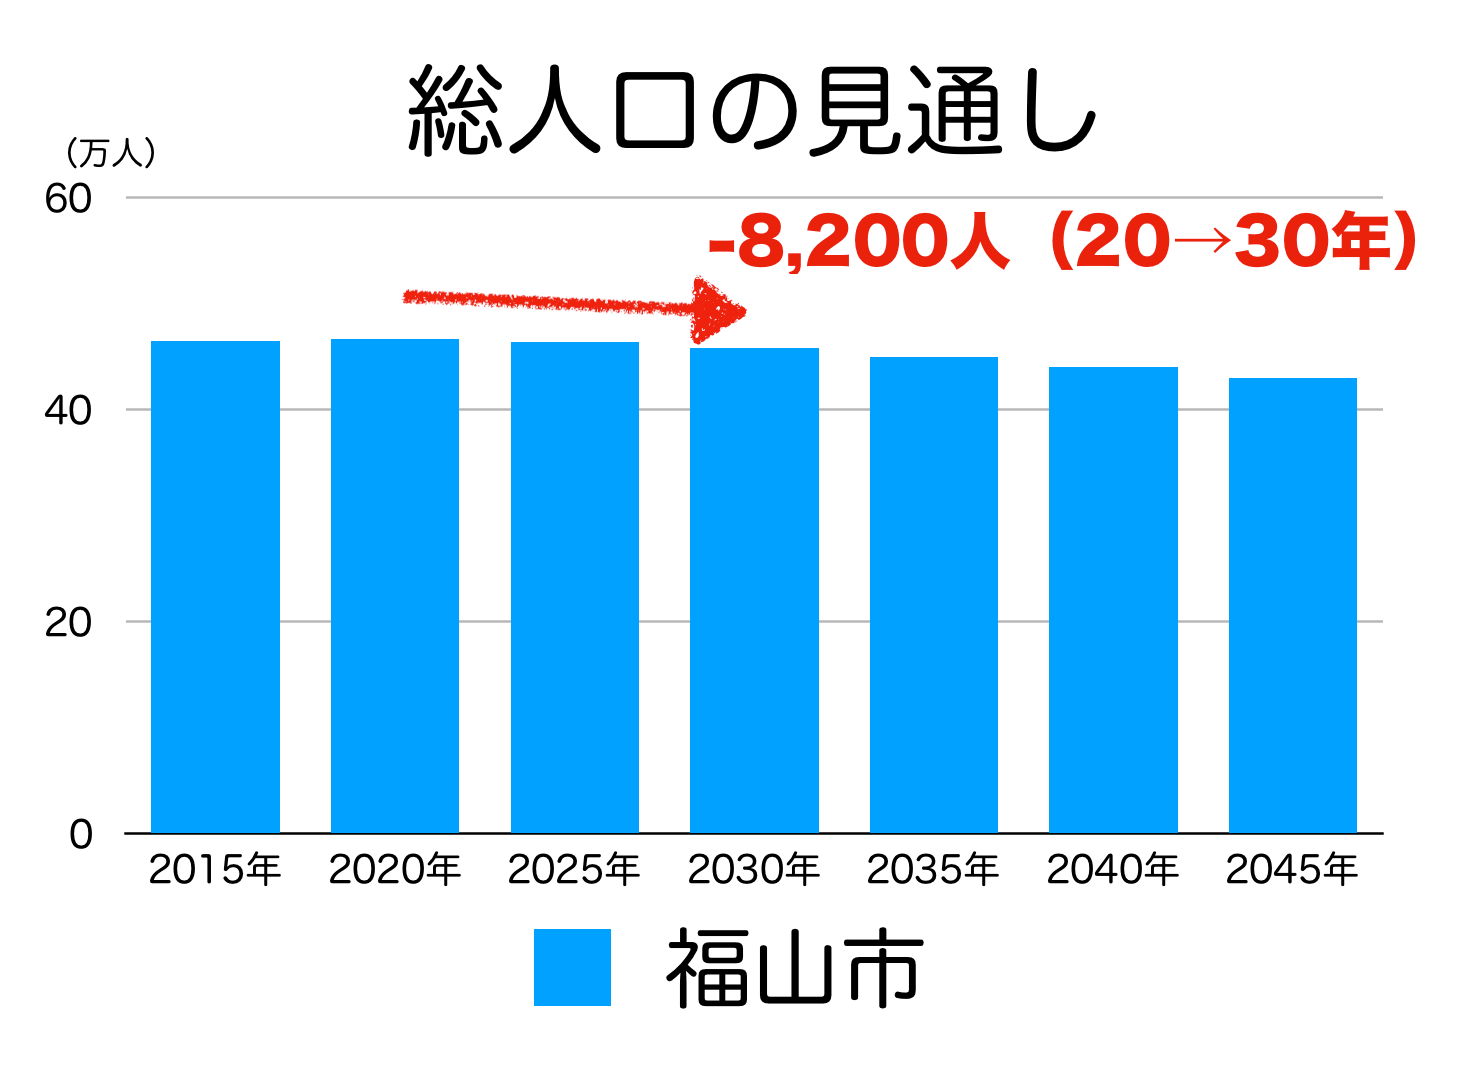 福山市の人口予測